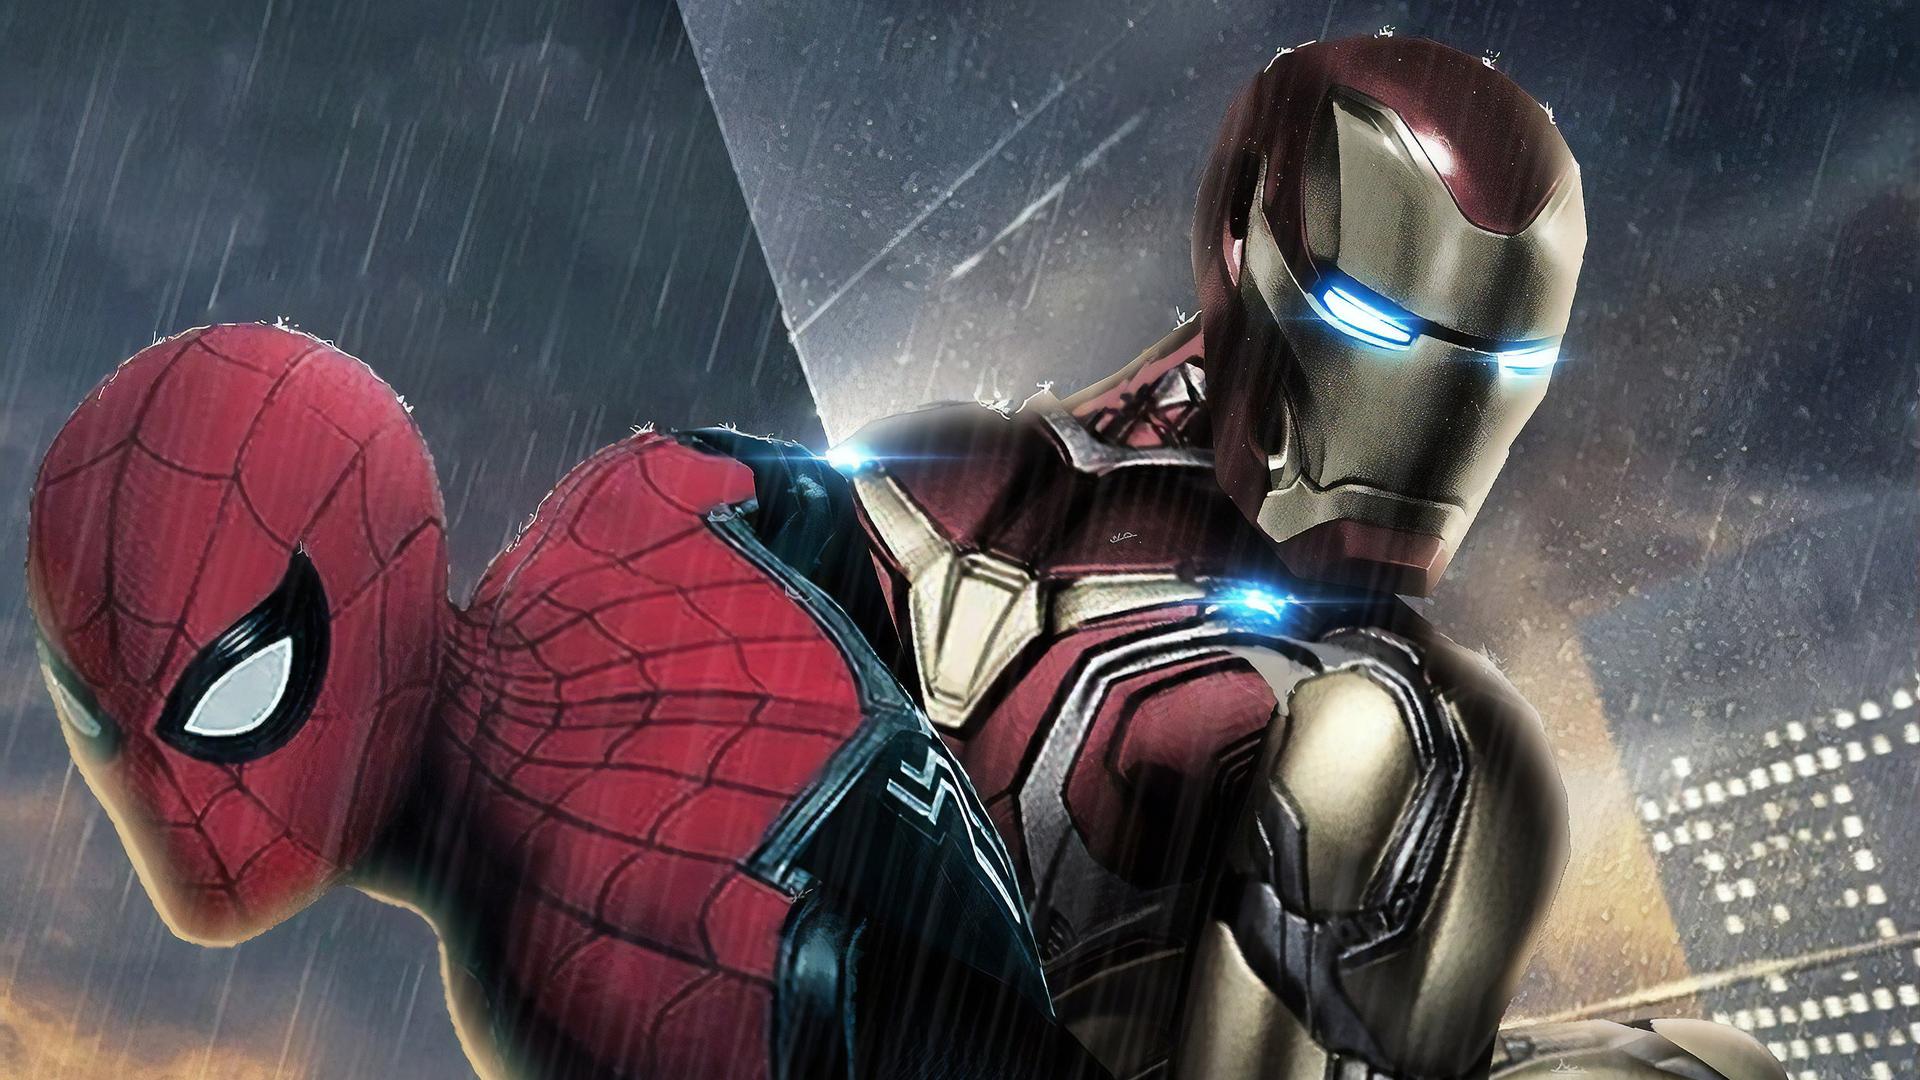 1920x1080 Iron Man And Spiderman Laptop Full Hd 1080p Hd 4k